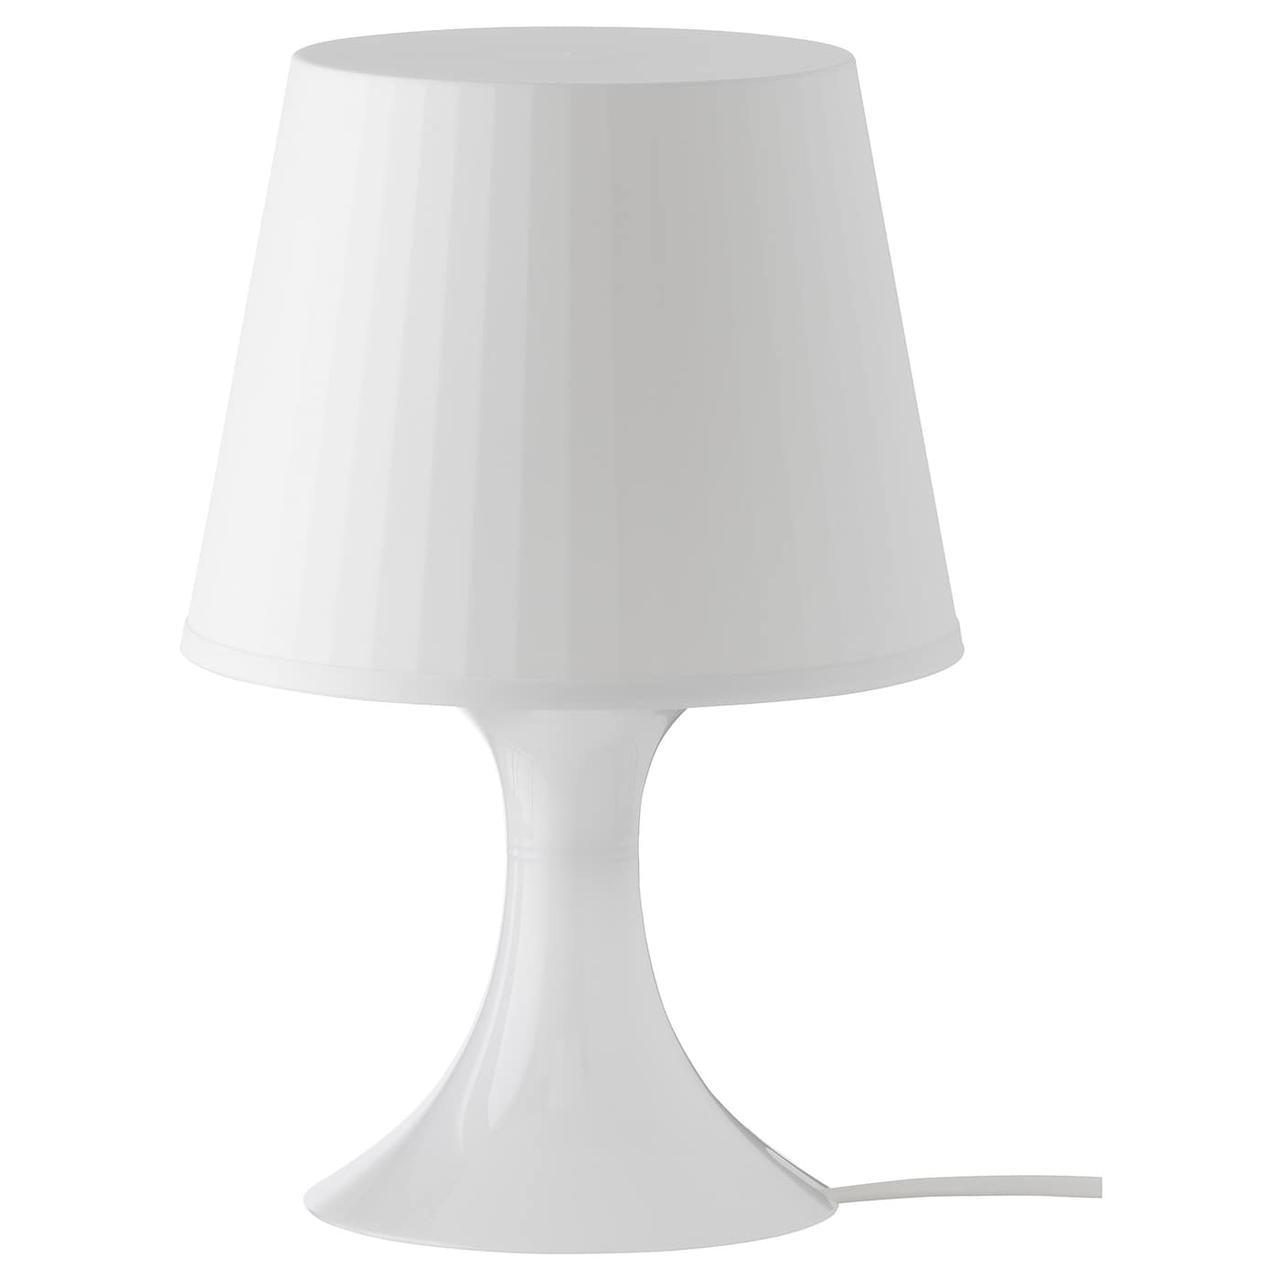 IKEA LAMPAN Настольная лампа 29 см